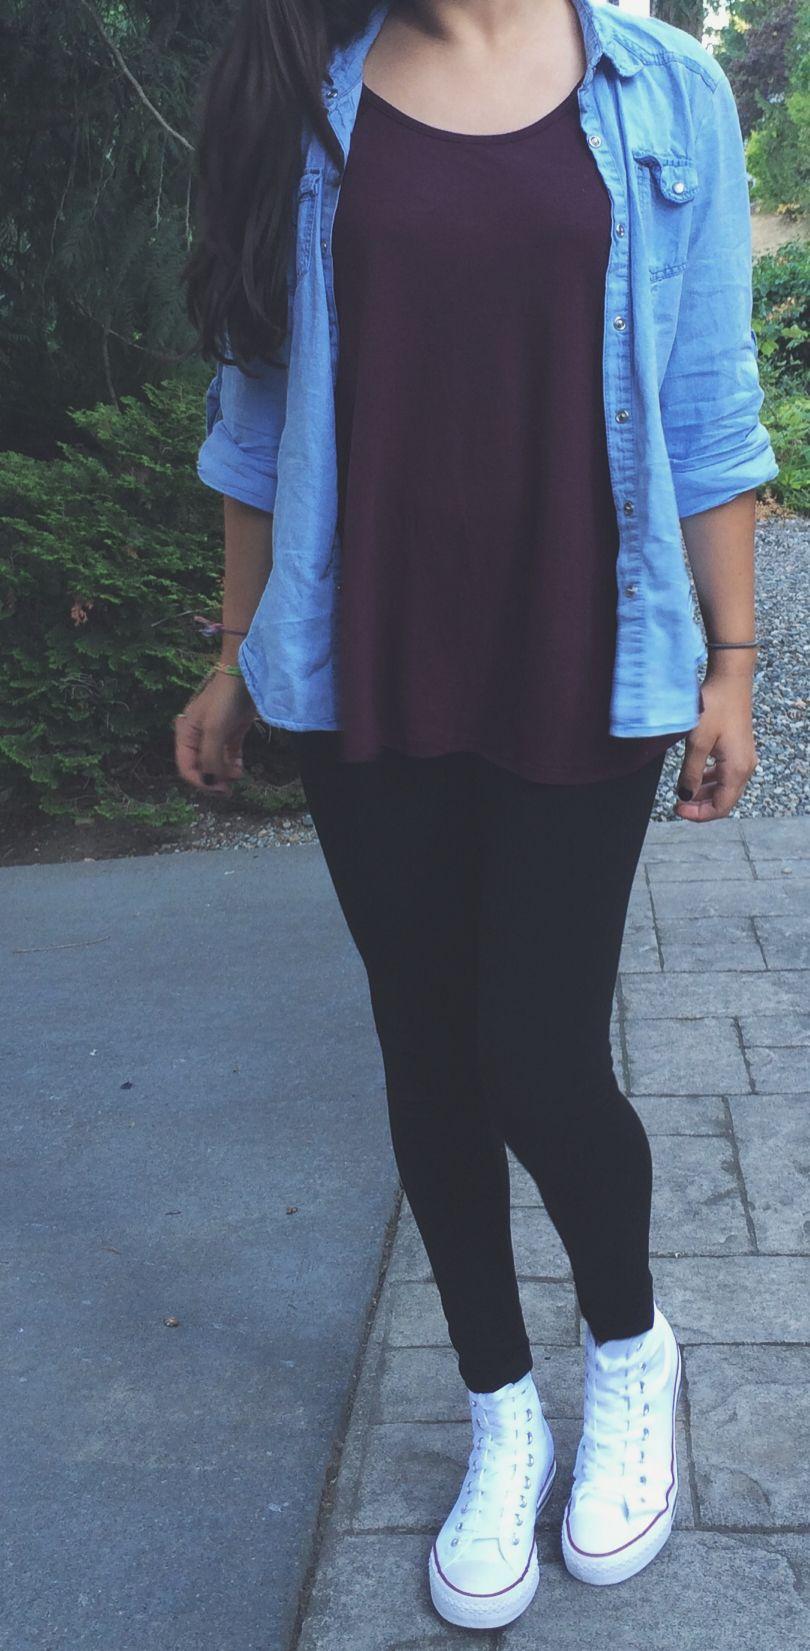 a45218c0e833 denim top    burgundy t    black leggings    high top white converse ...